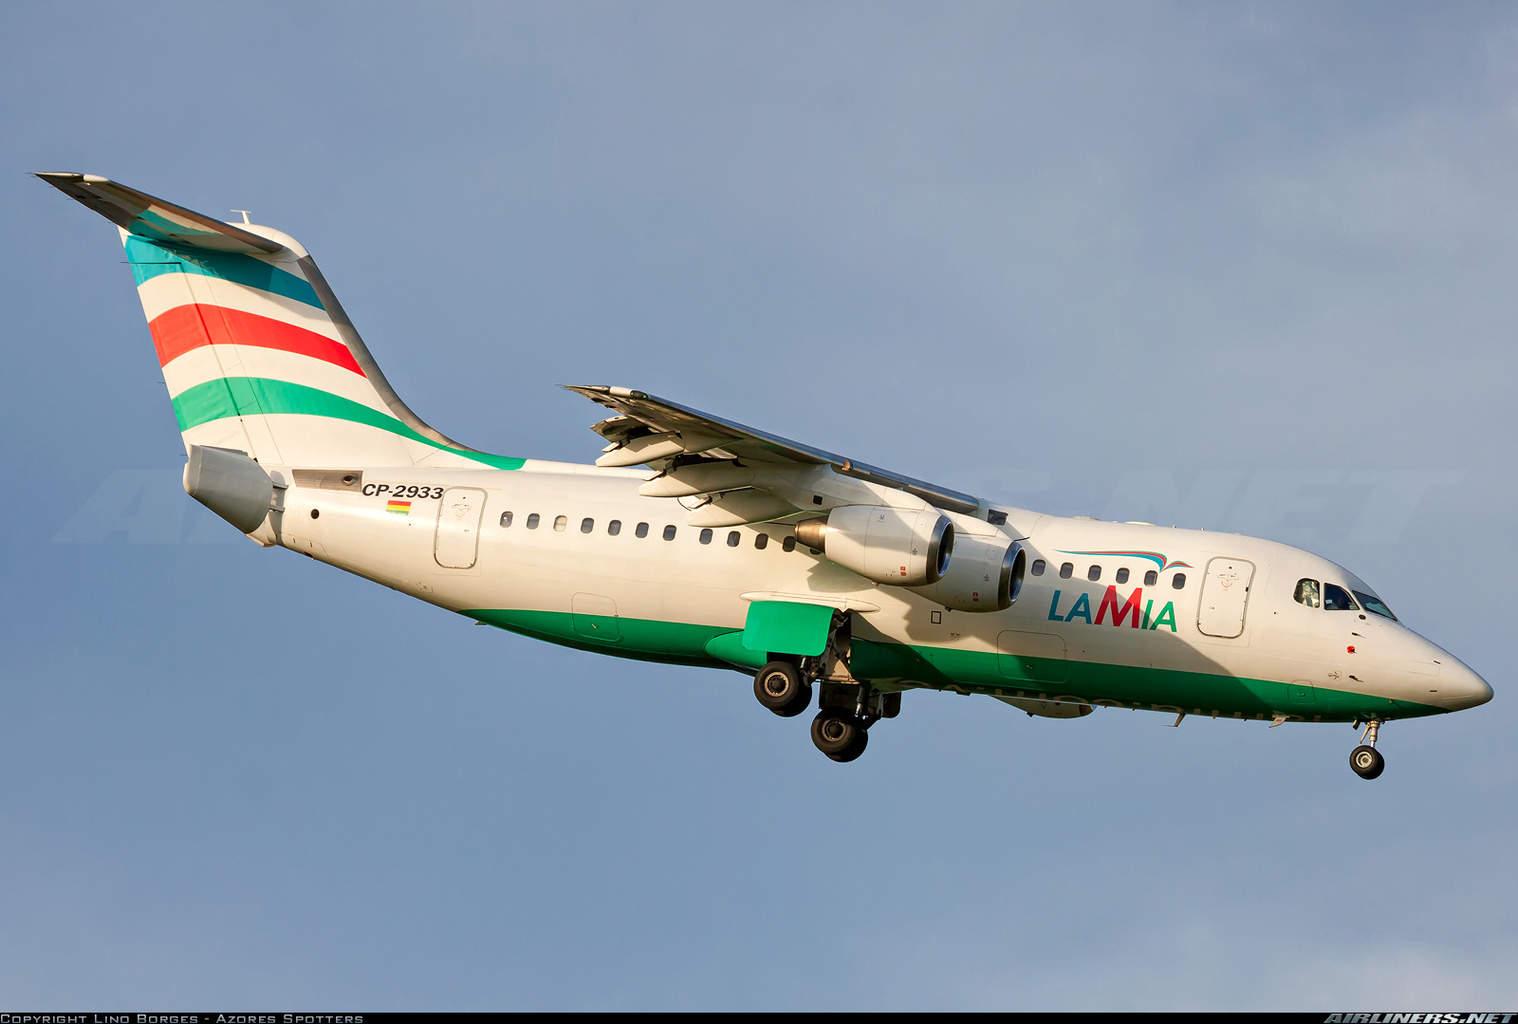 LAMIA Bolivia RJ85 crashes with the Chapecoense football team onboard